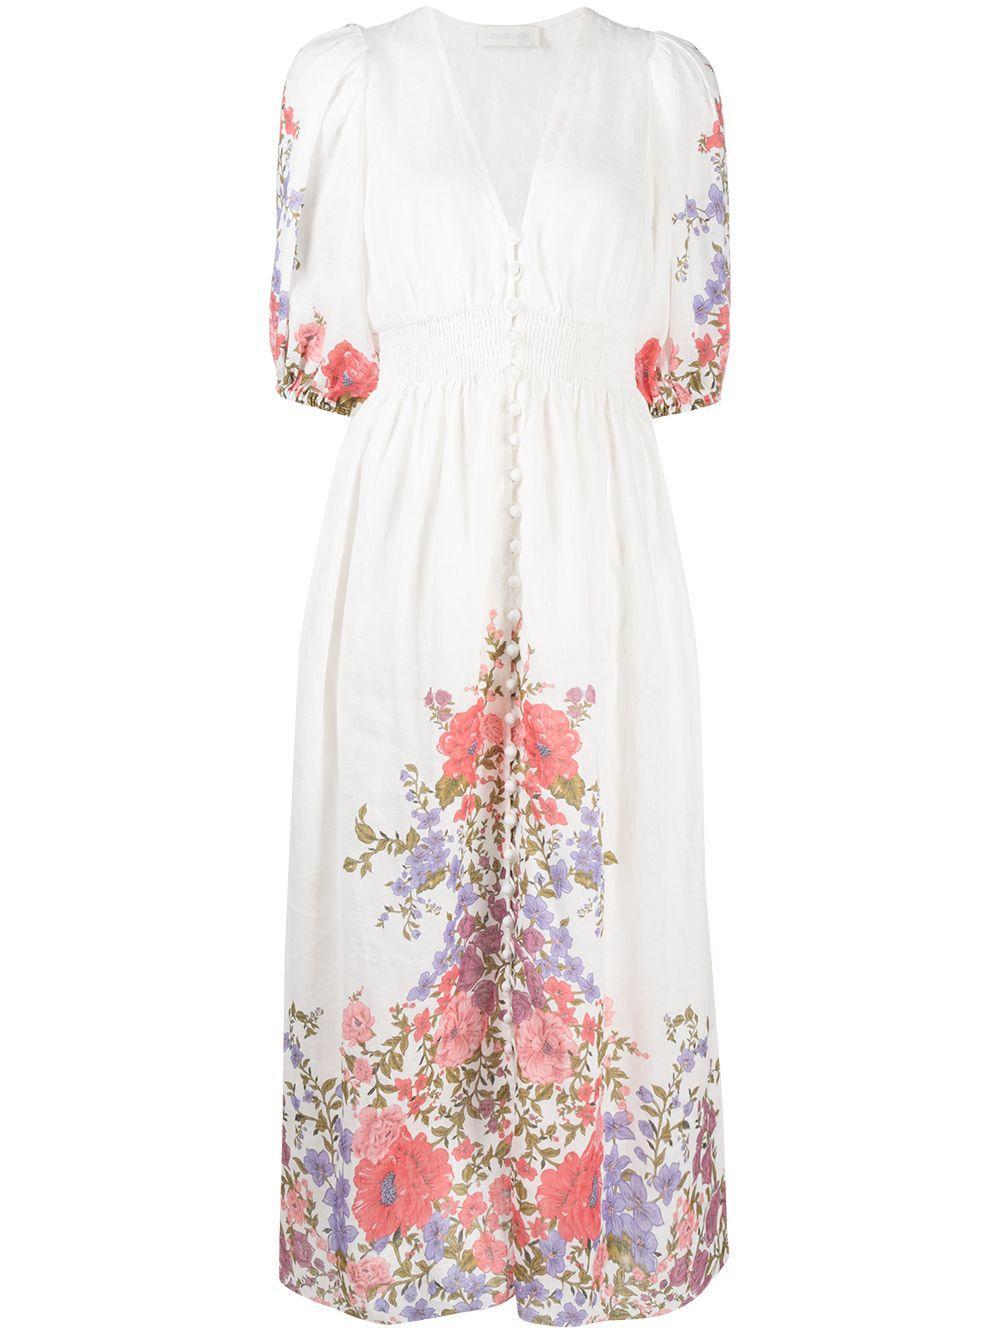 Poppy Shirred Waist Floral Print Dress Item # 9695DPOP